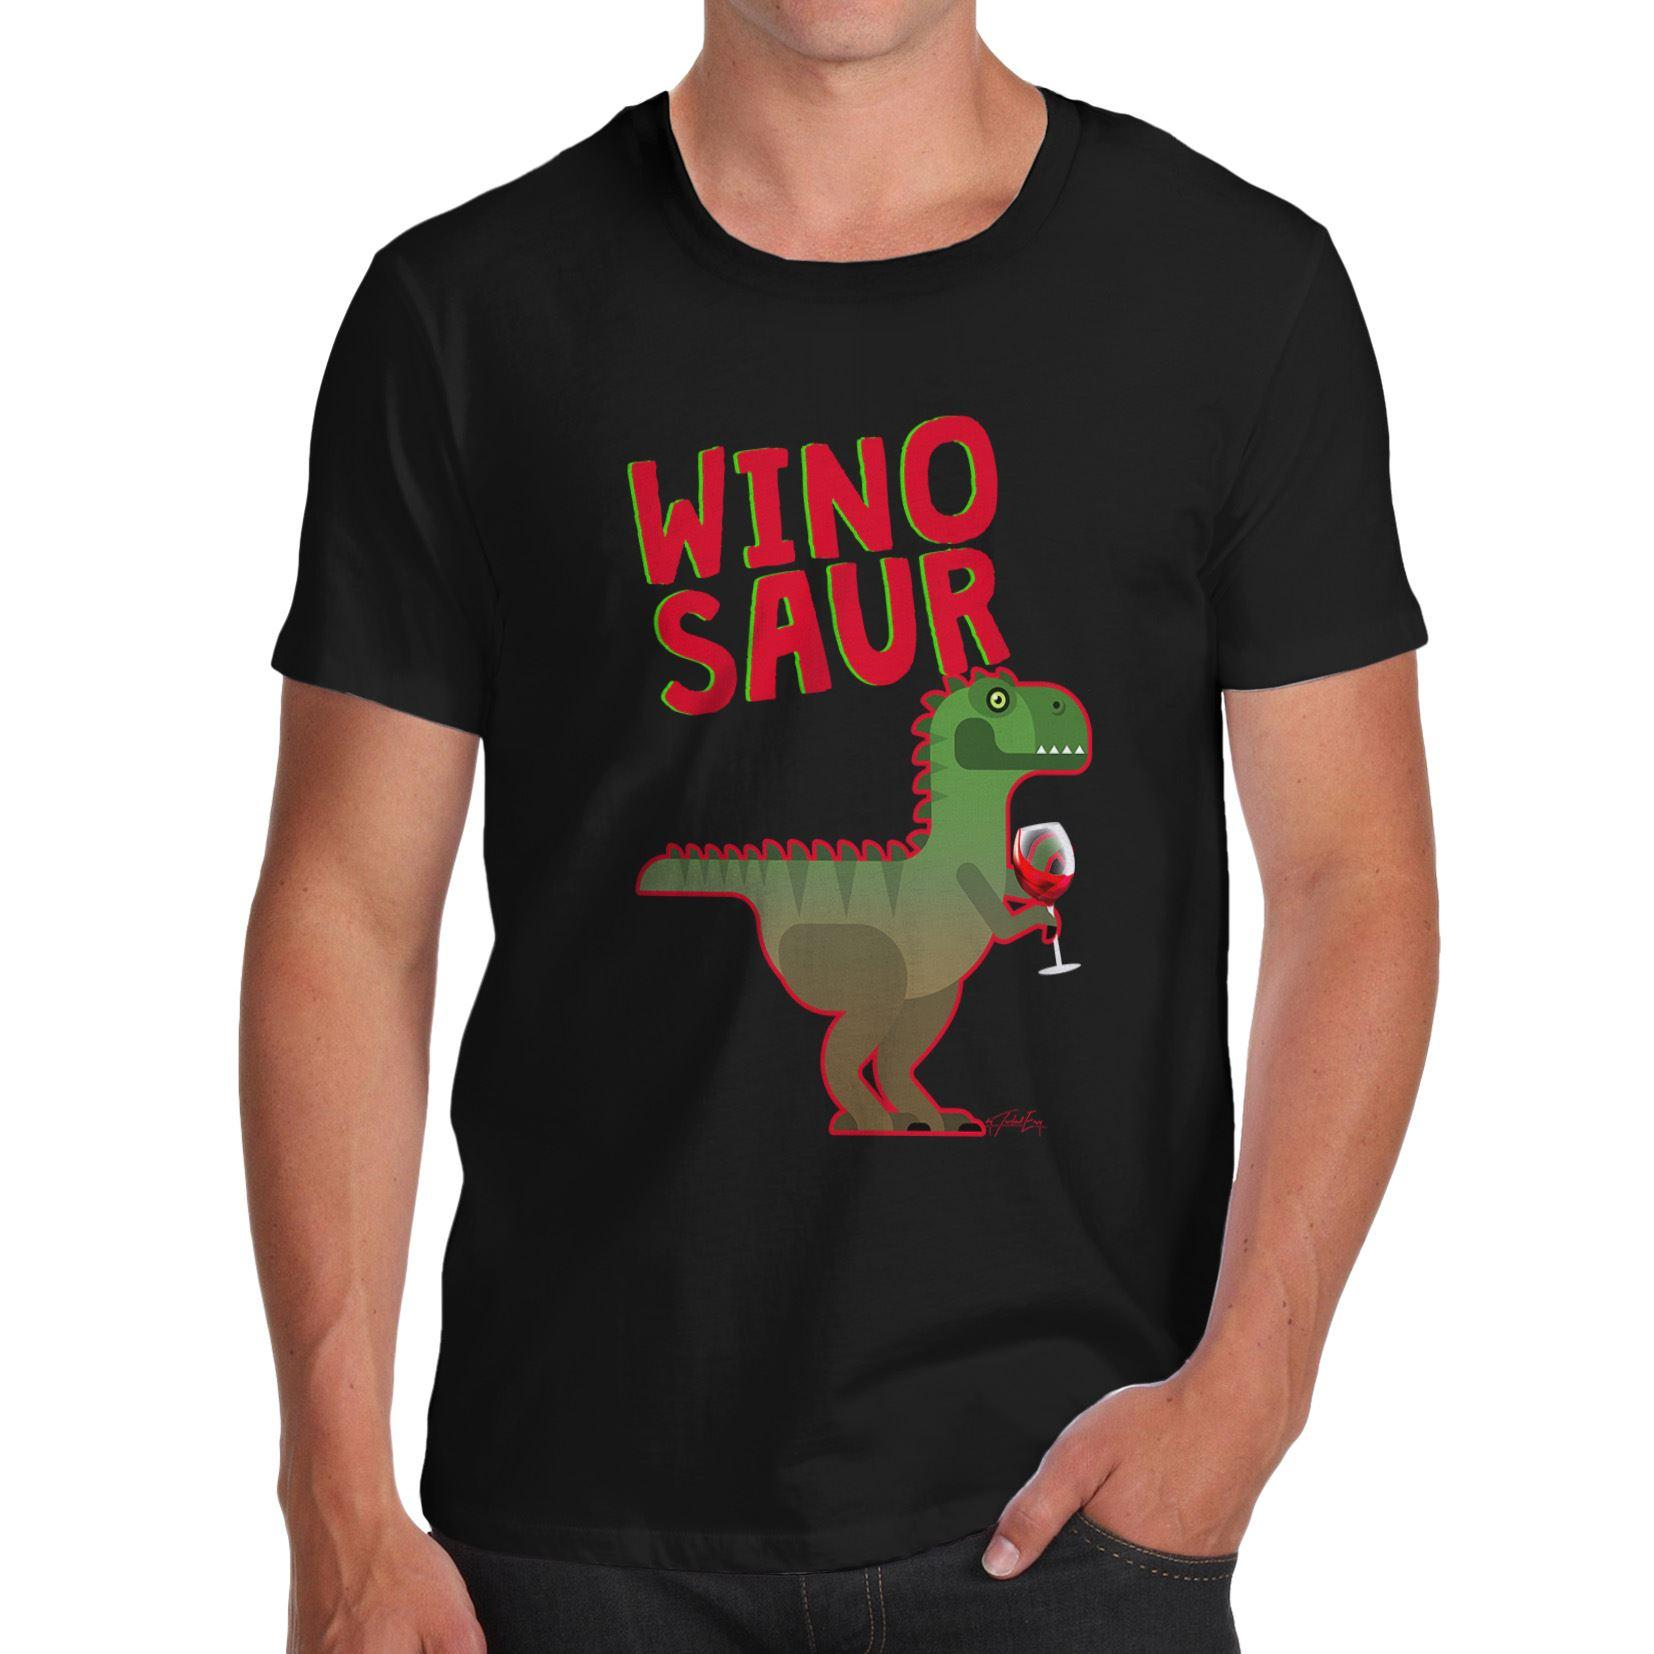 edecaccaa Twisted Envy Winosaur Funny Wine Dinosaur Men'S Funny T Shirt Dress ...